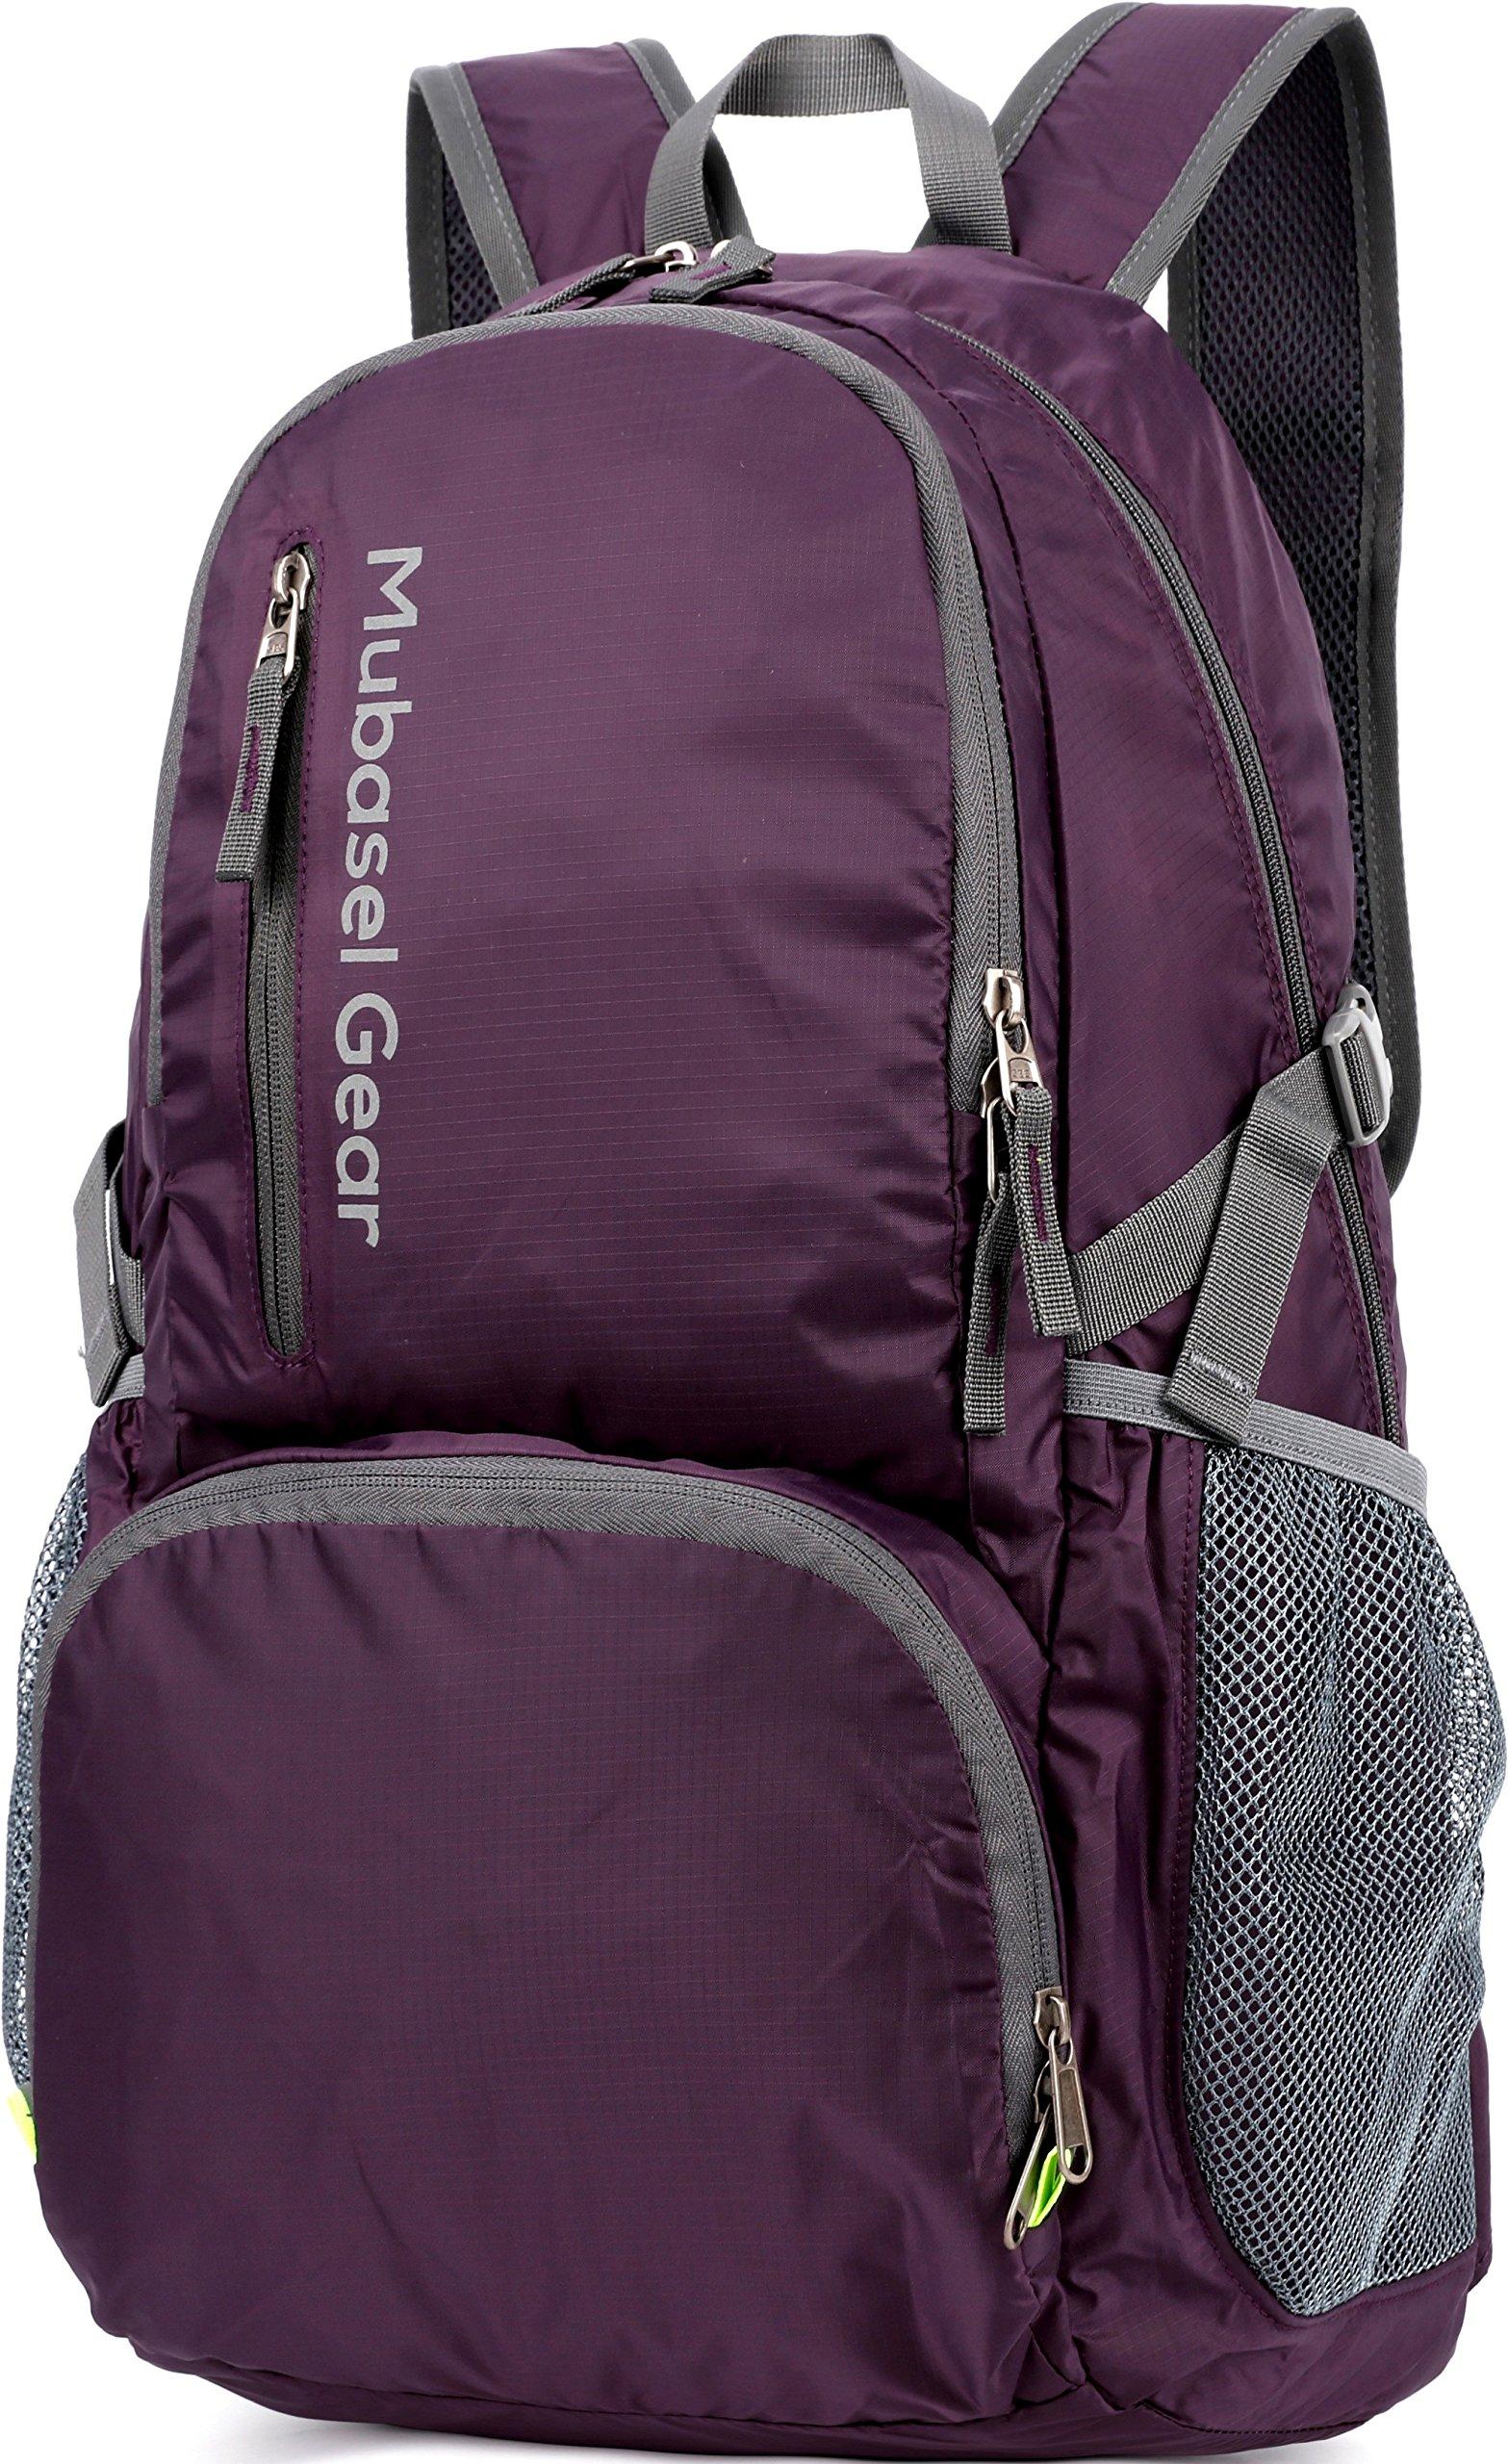 Mubasel Gear Backpack - Lightweight Backpacks for Travel Hiking - Daypack for Women Men (Purple) by Mubasel Gear (Image #7)